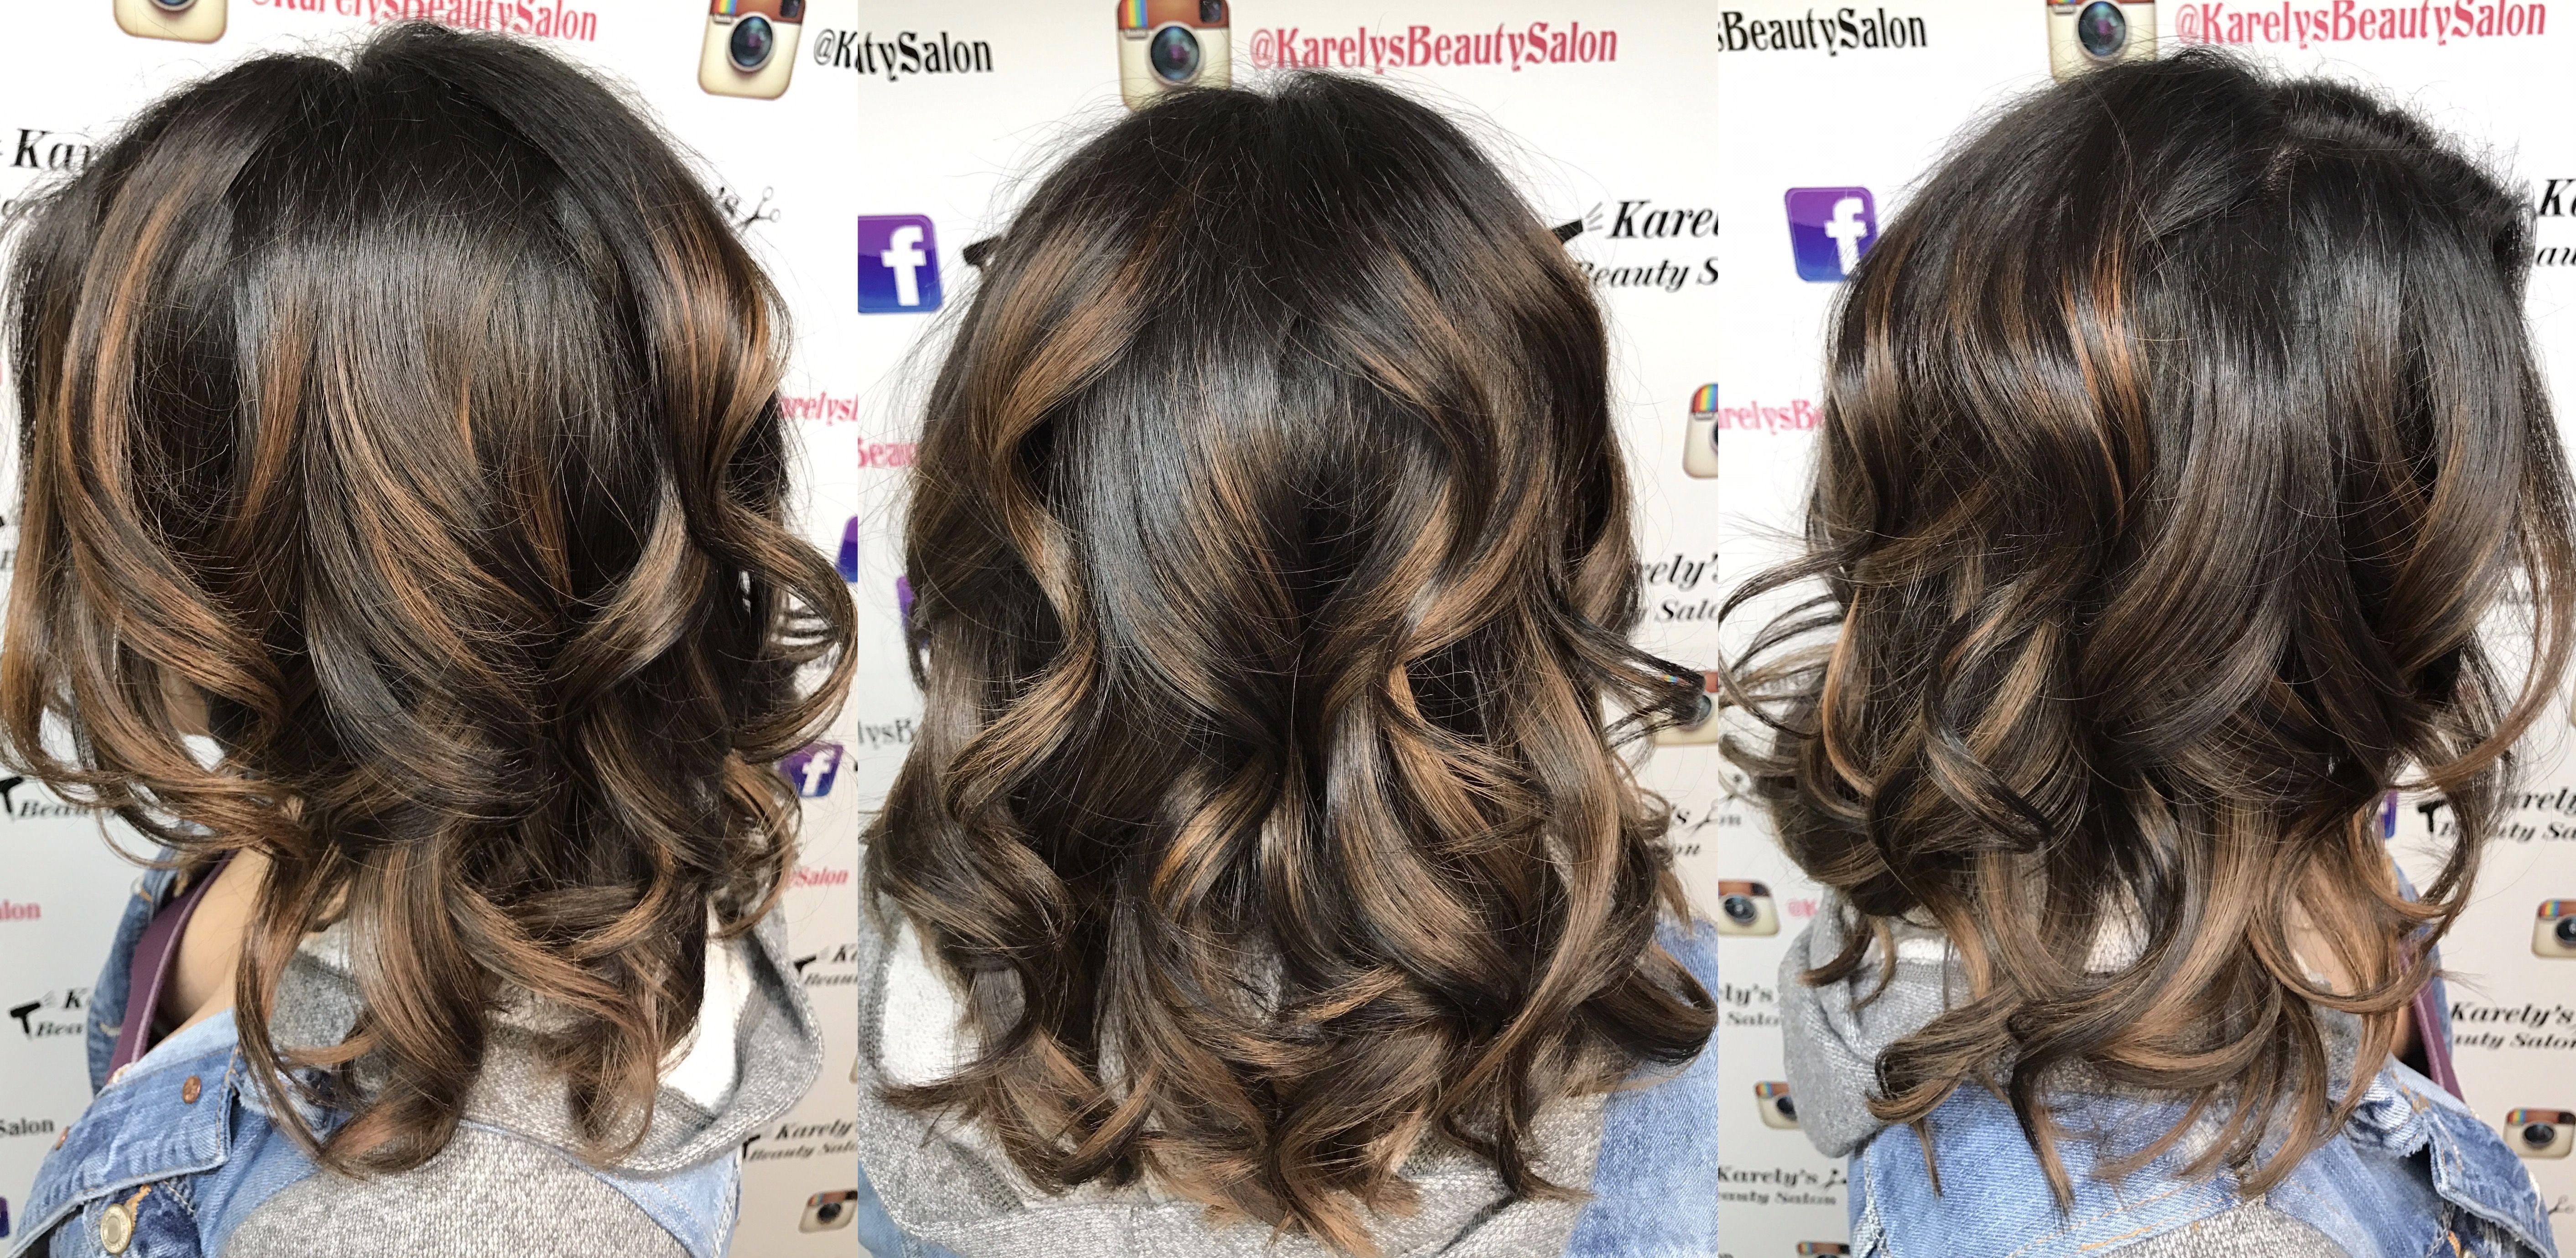 Cool tone caramel balayage hair color u styles pinterest